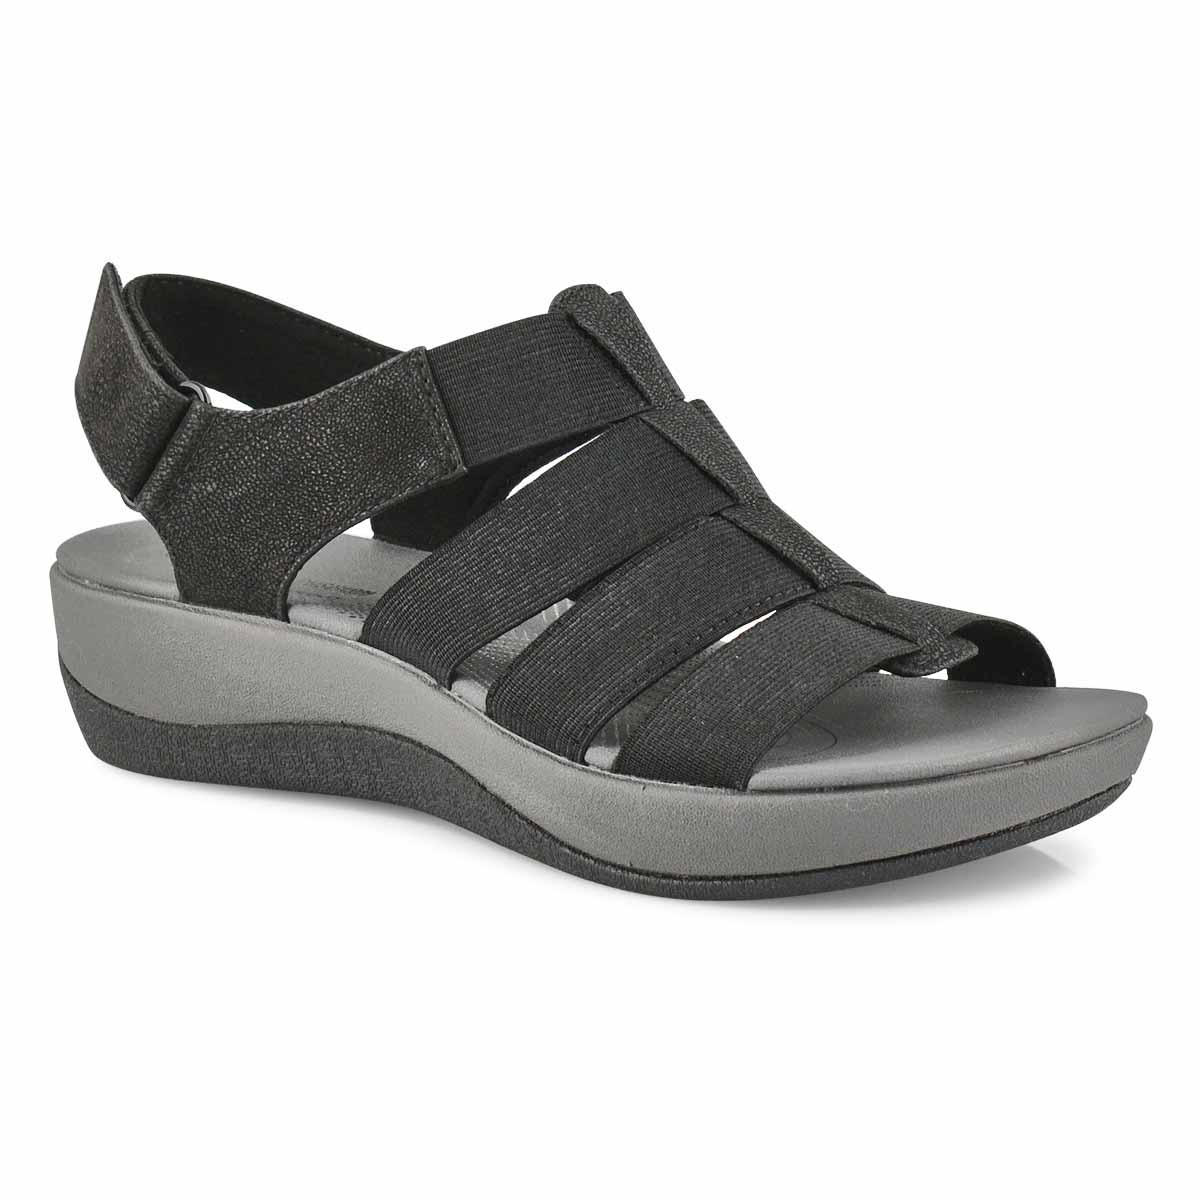 Women's ARLA SHAYLIE black casual wedge sandals